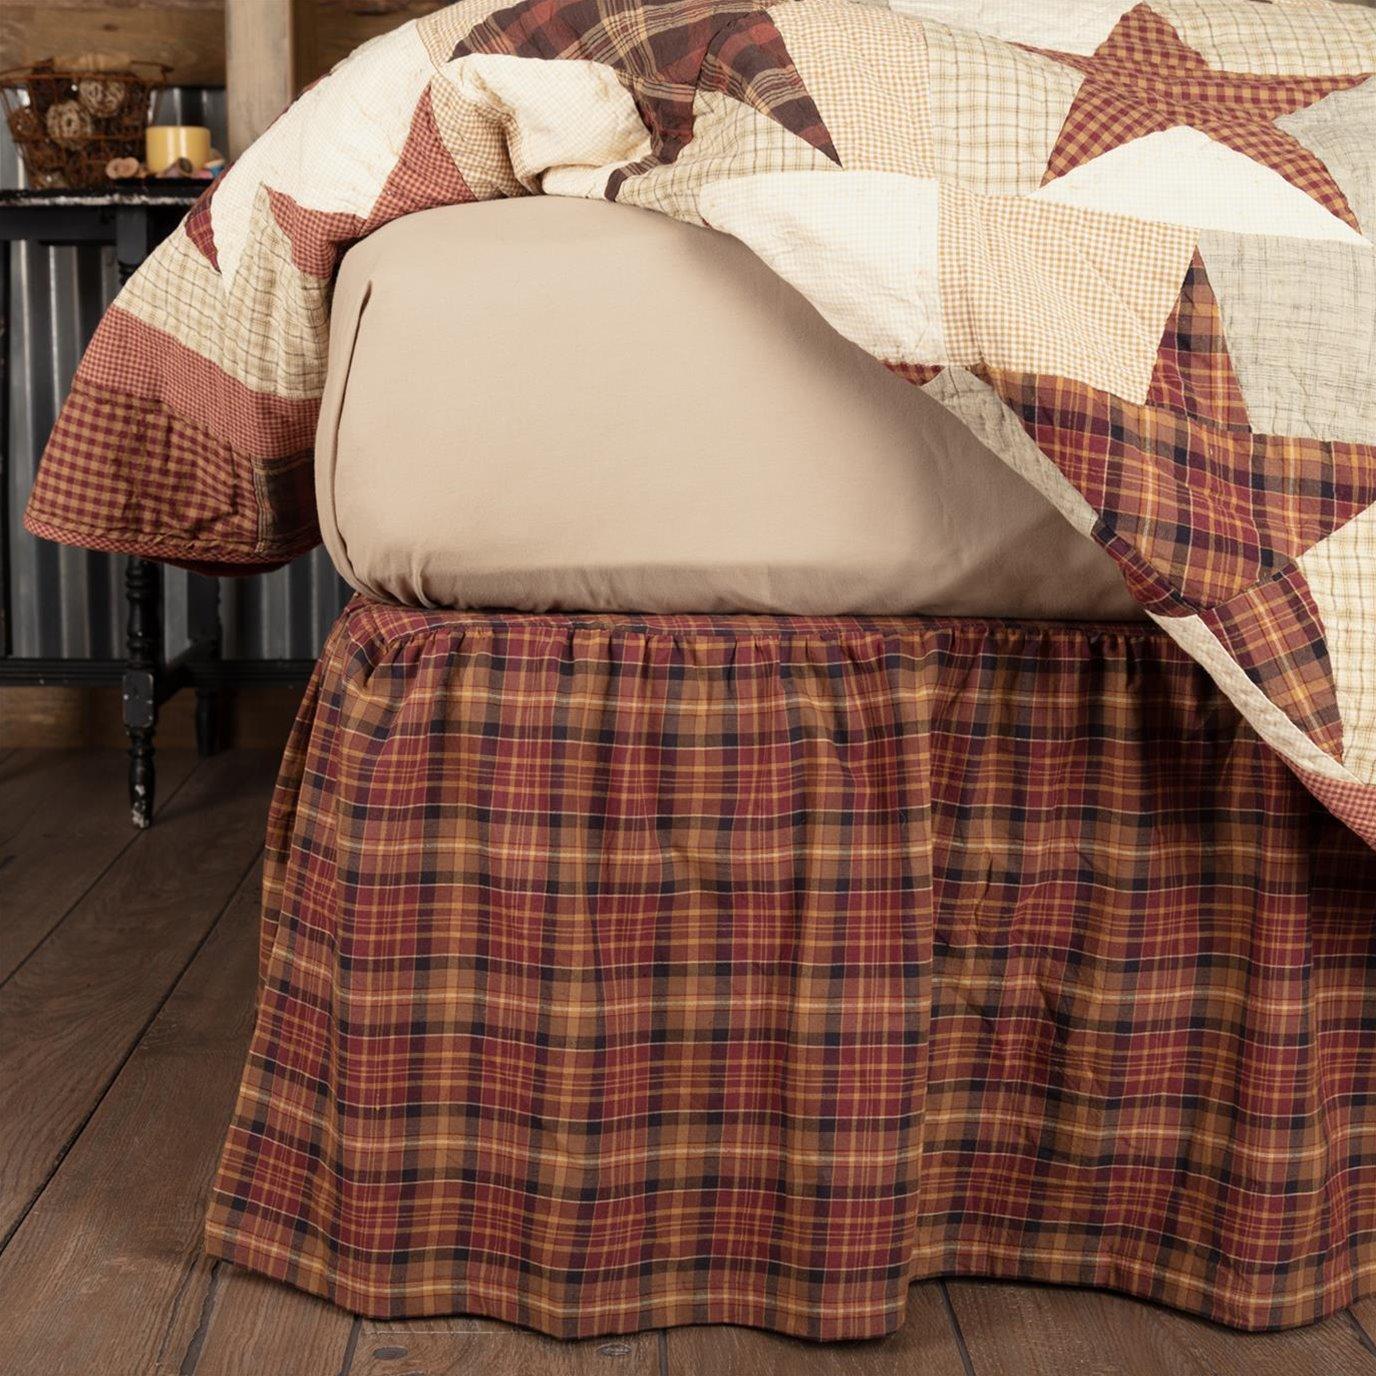 Abilene Star Twin Bed Skirt 39x76x16